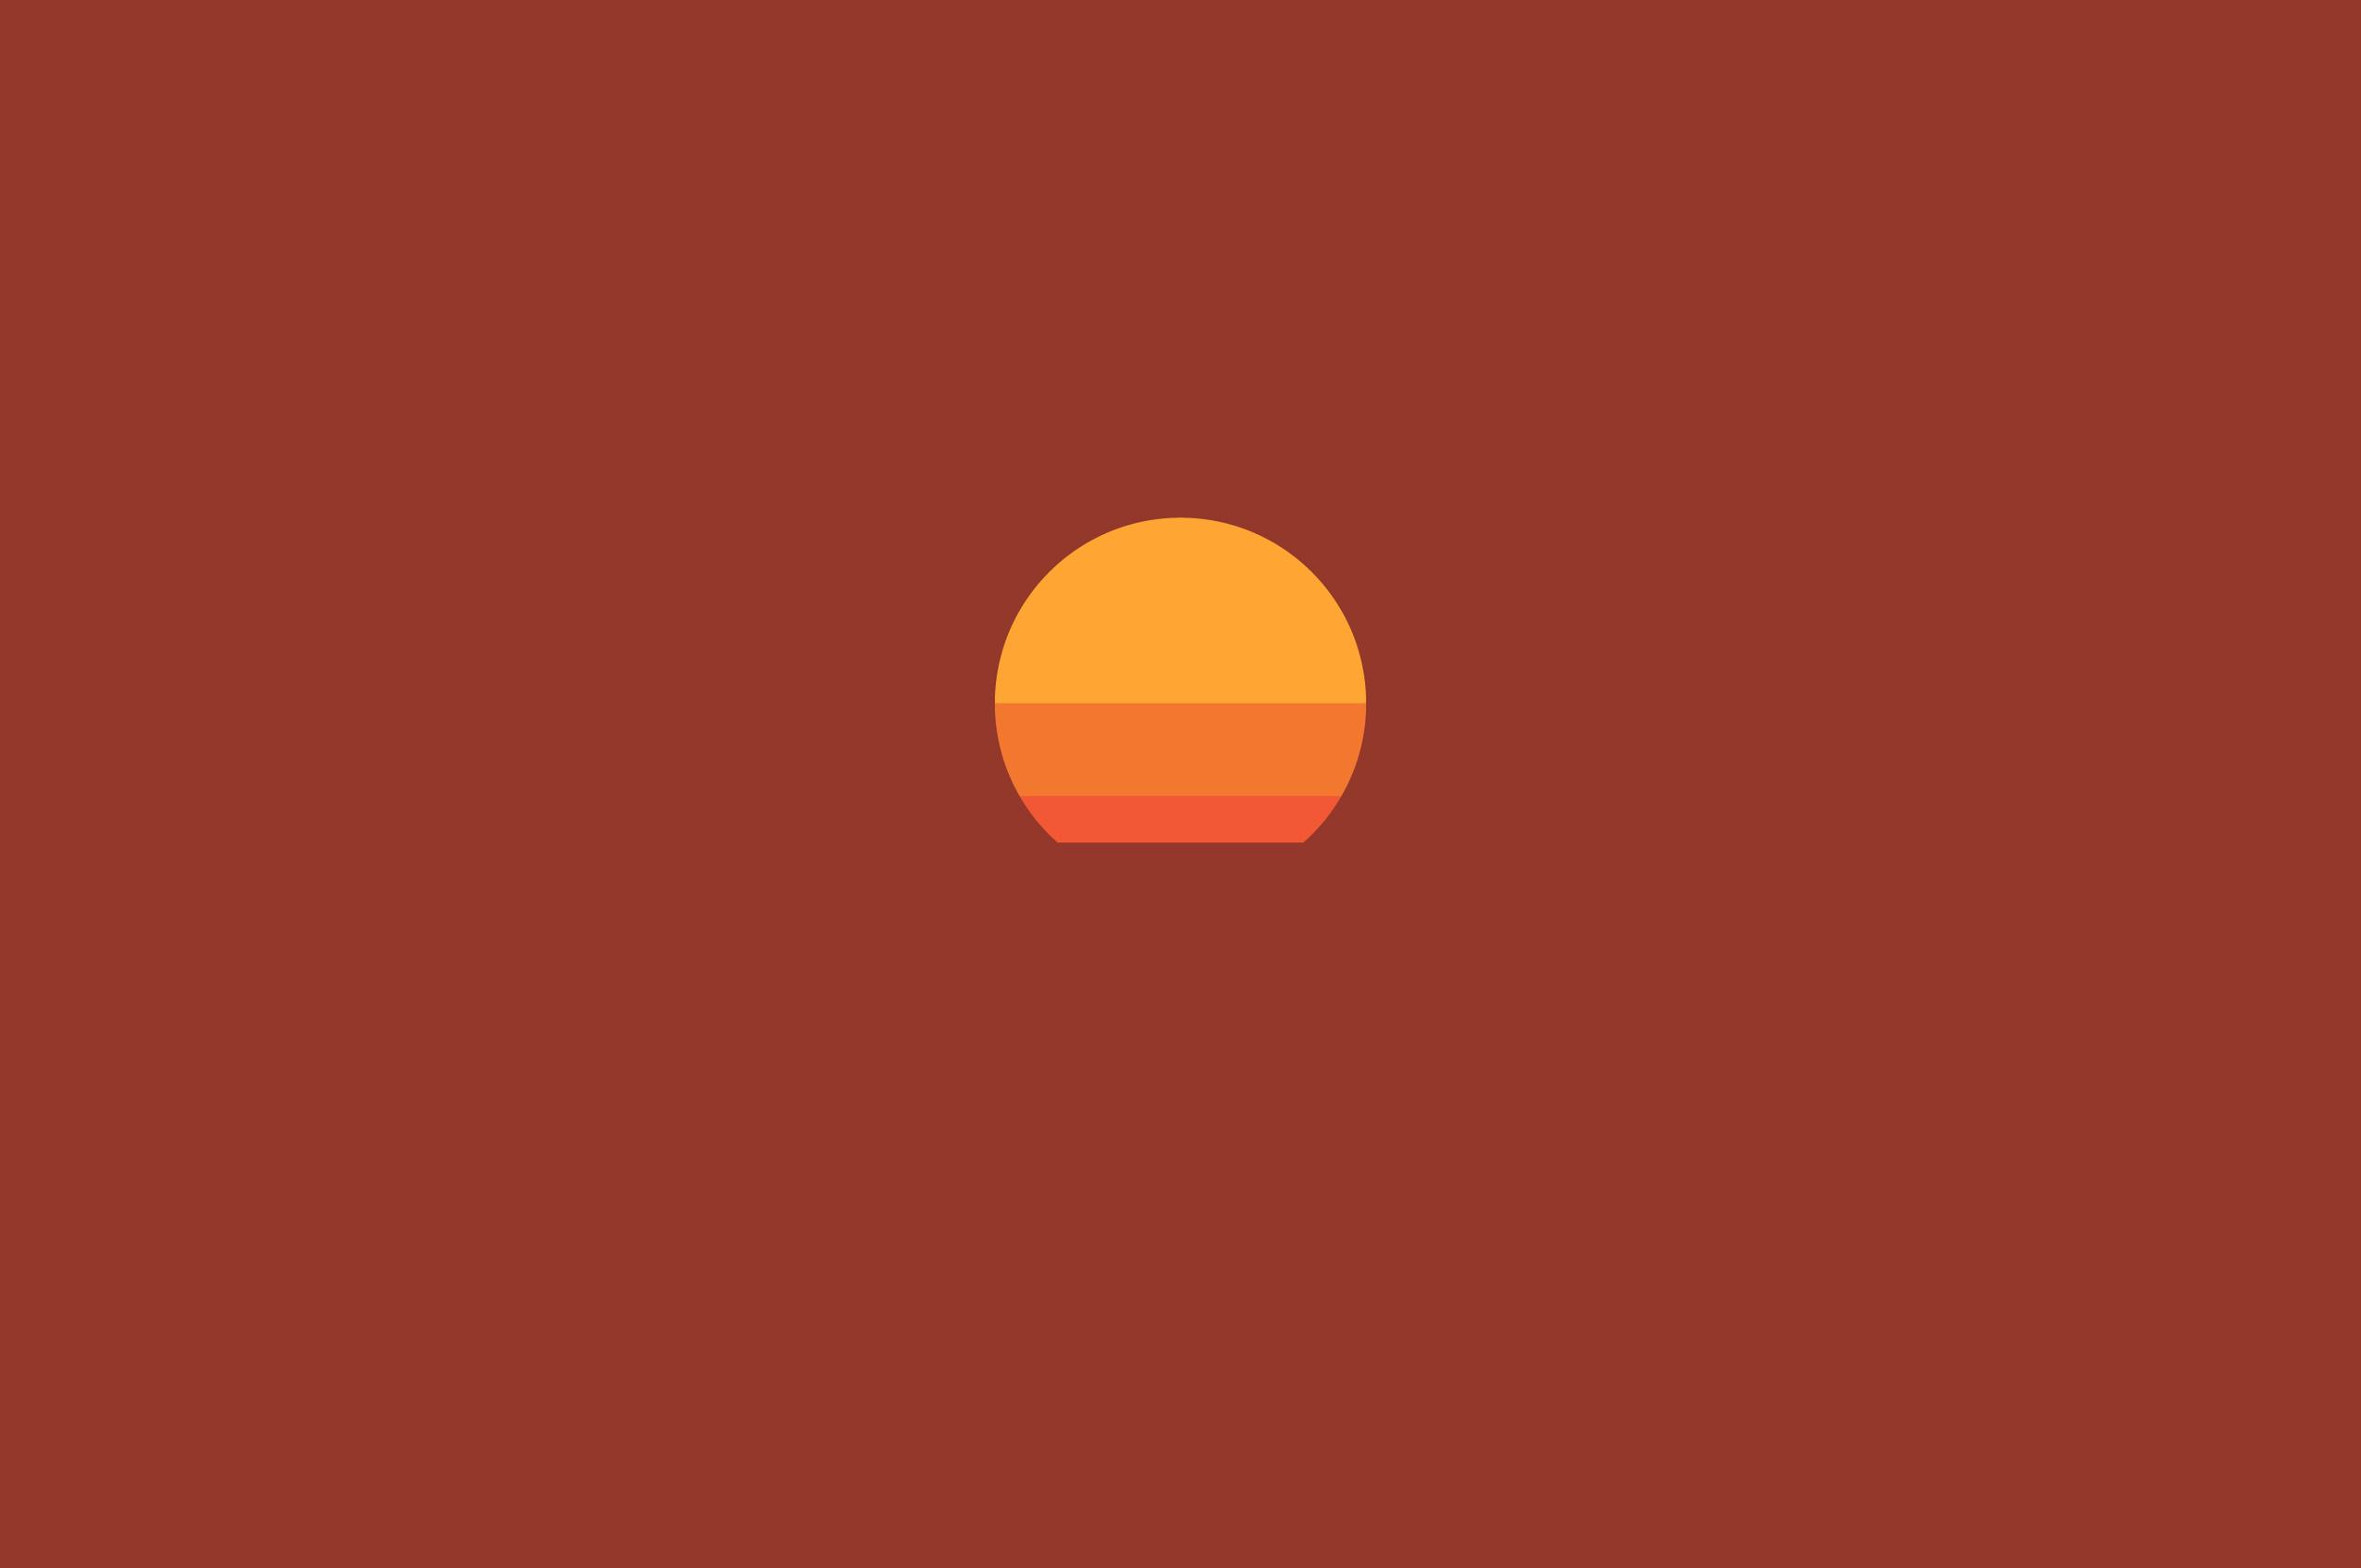 sunset-minimal-art-ot.jpg